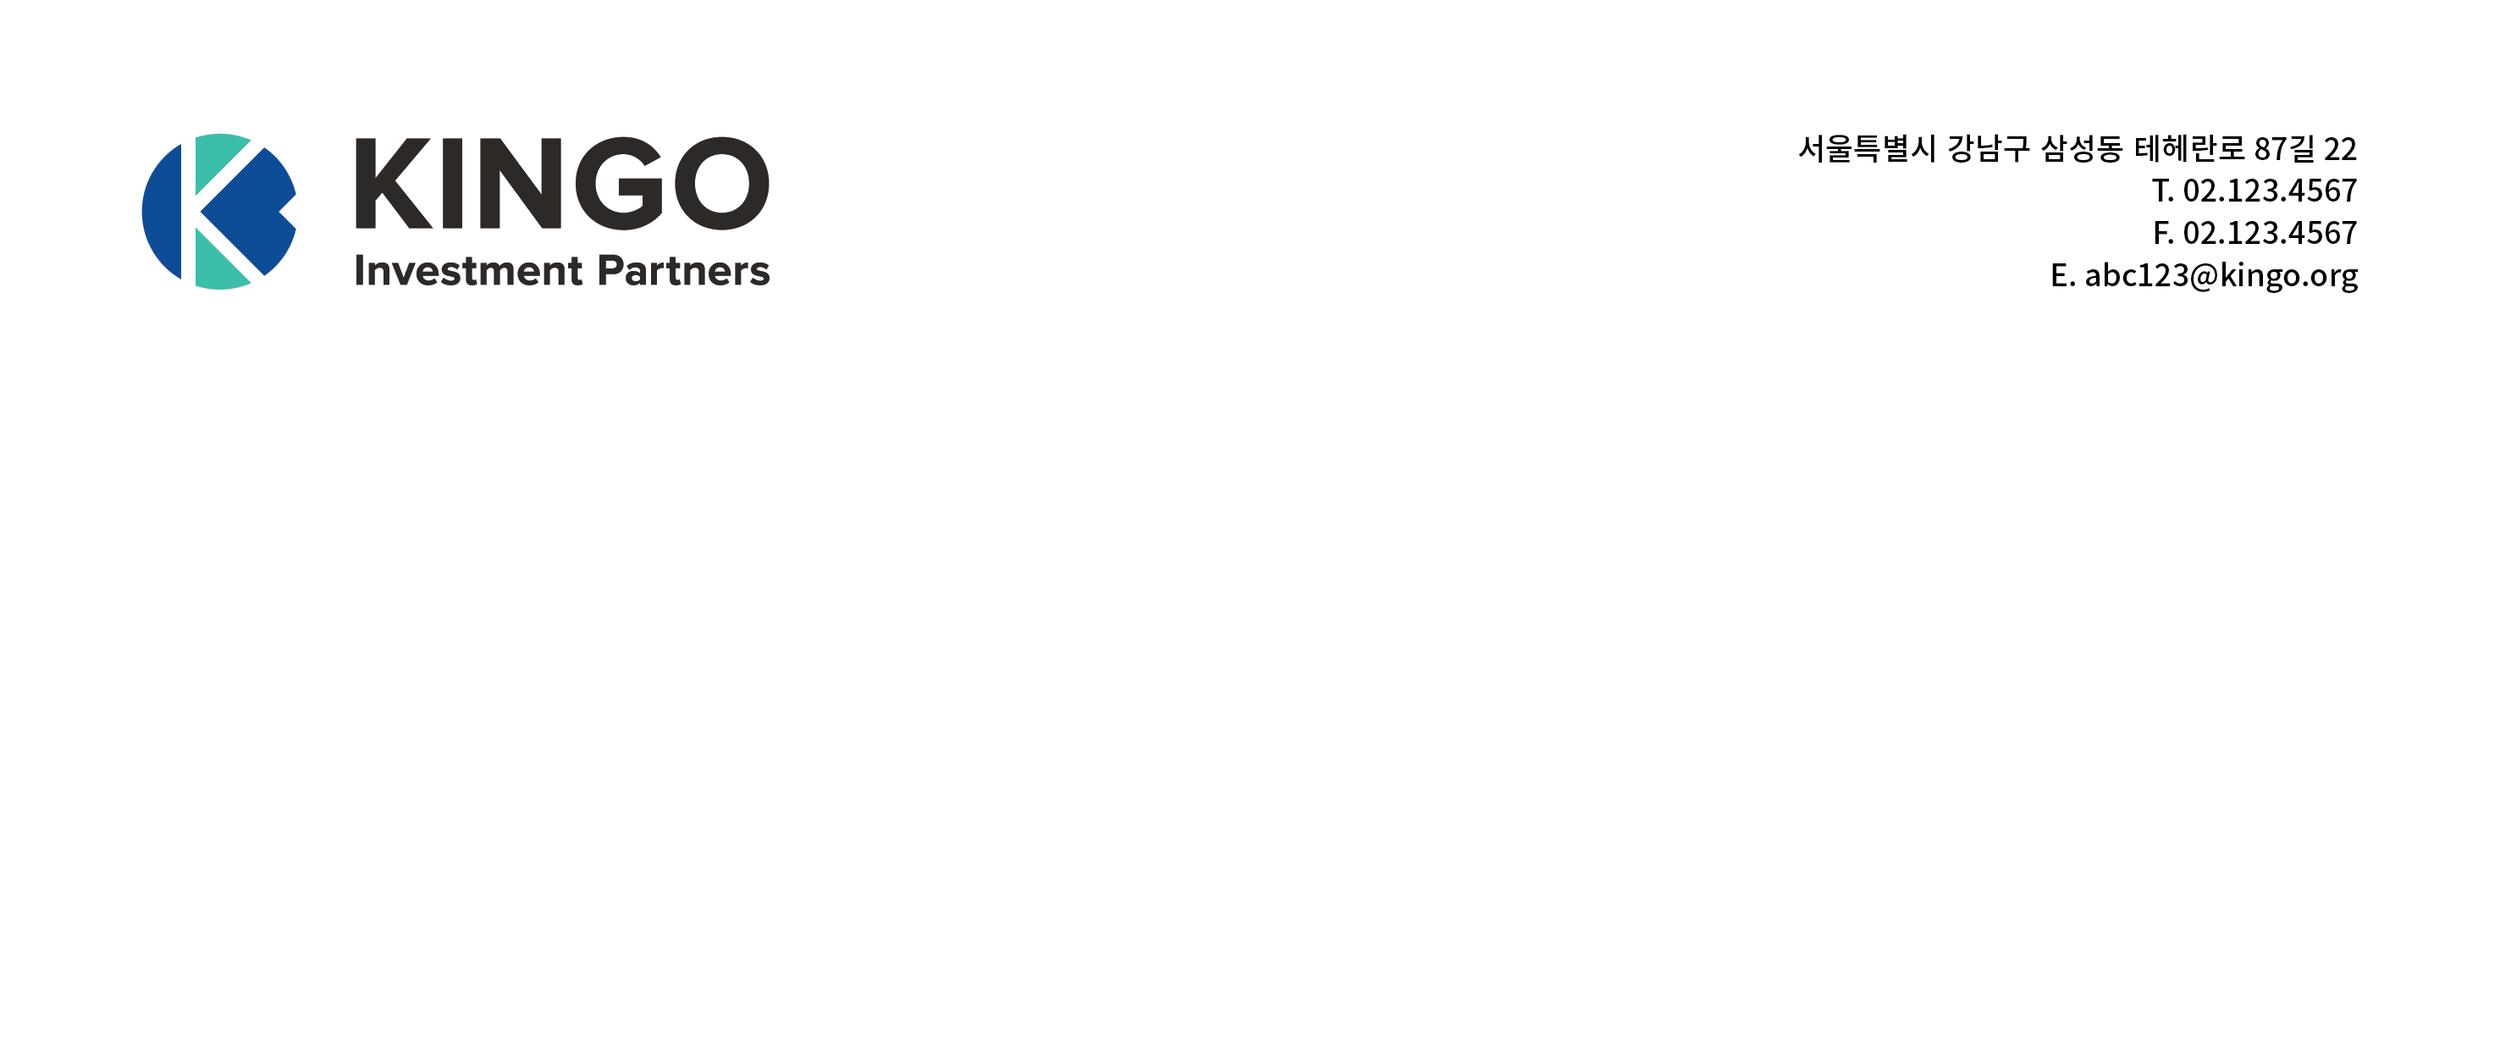 Kingo_Letterhead-Business Mail_Kingo Business Mail F.png